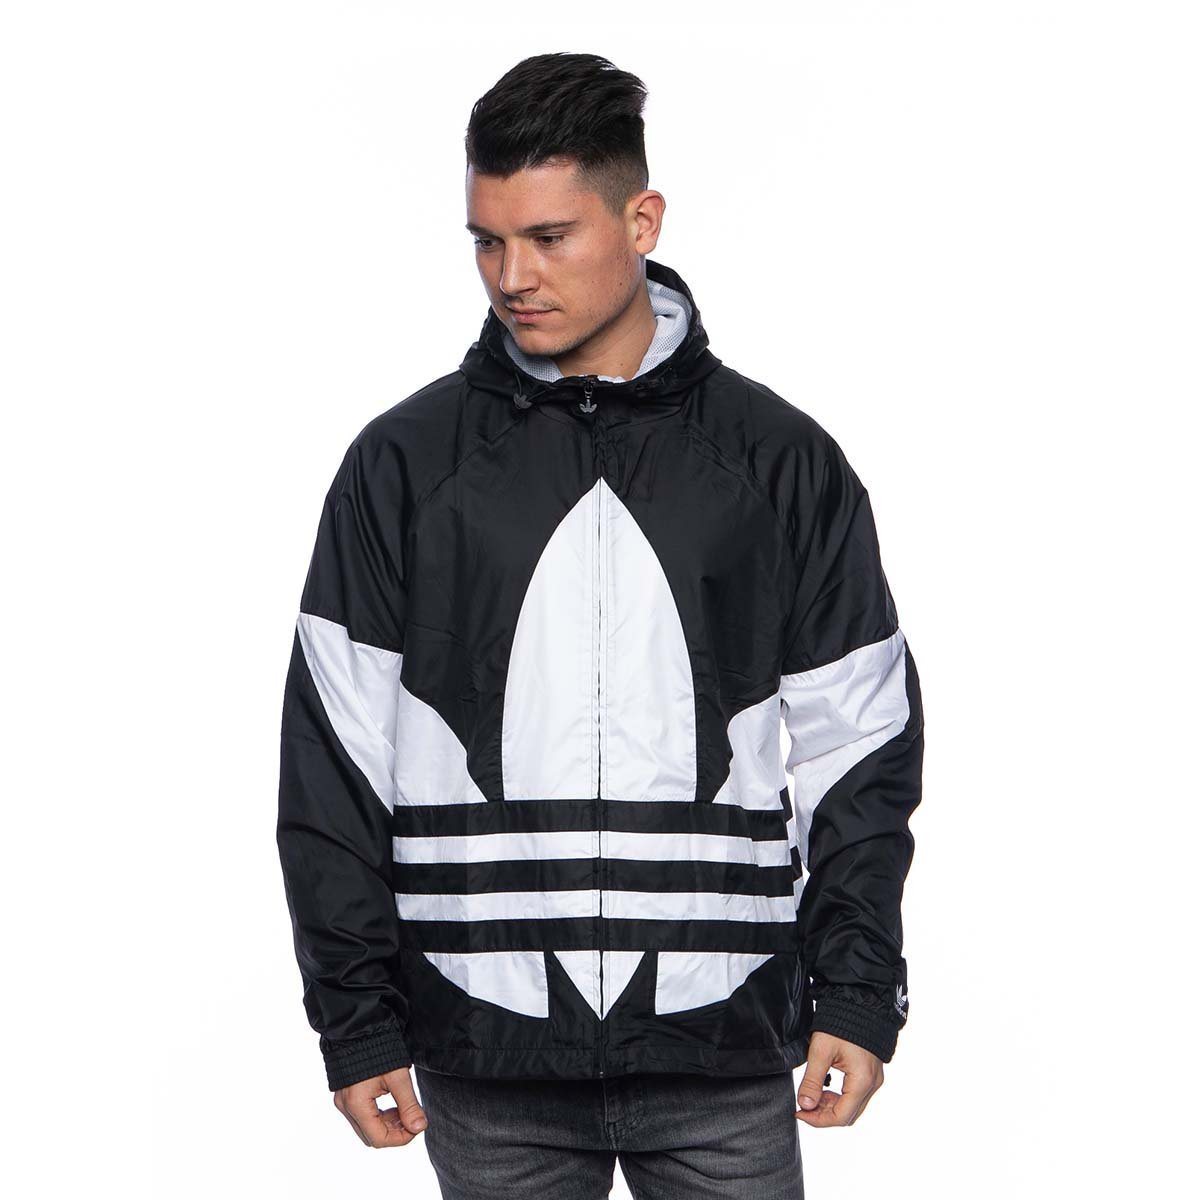 Kurtka Adidas Originals Big Trefoil Windbreaker Jacket black